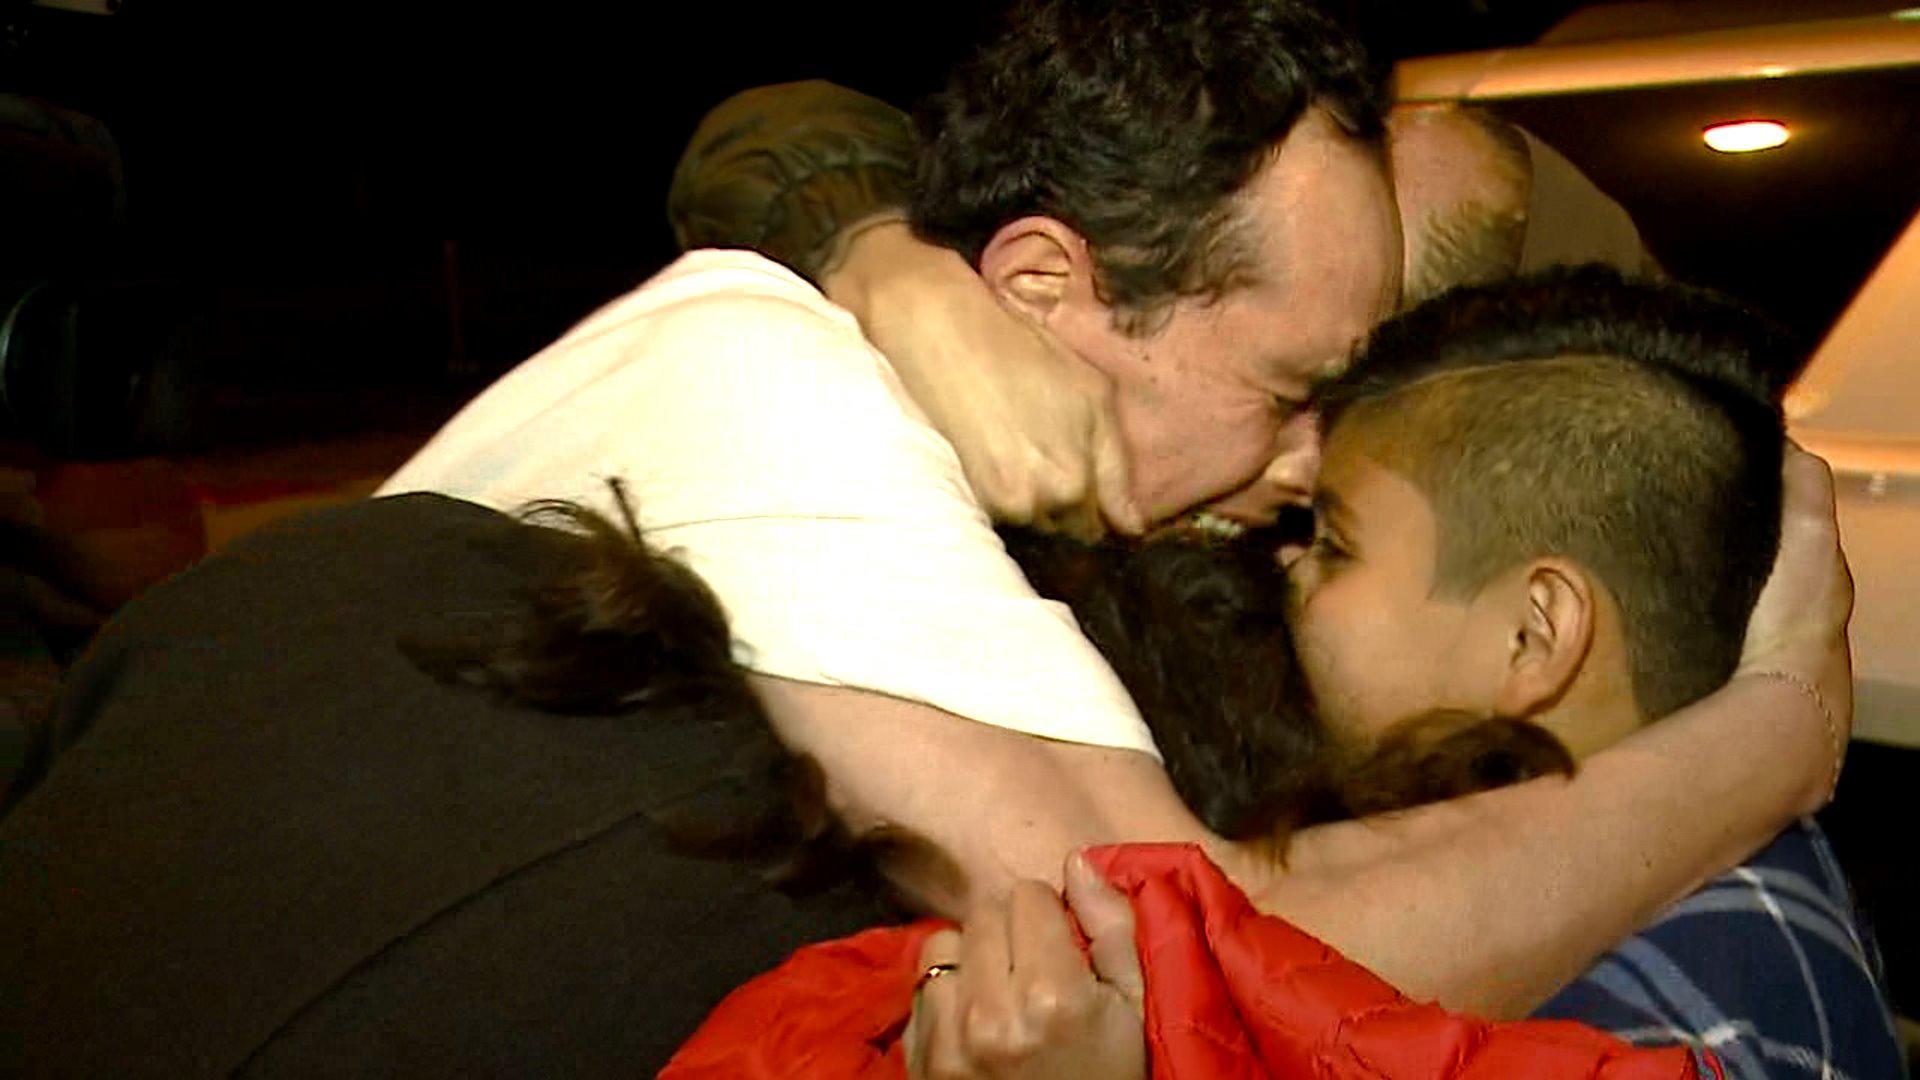 Hugo Mejia reunited with his family on Nov. 22, 2017. (Credit: KTXL)